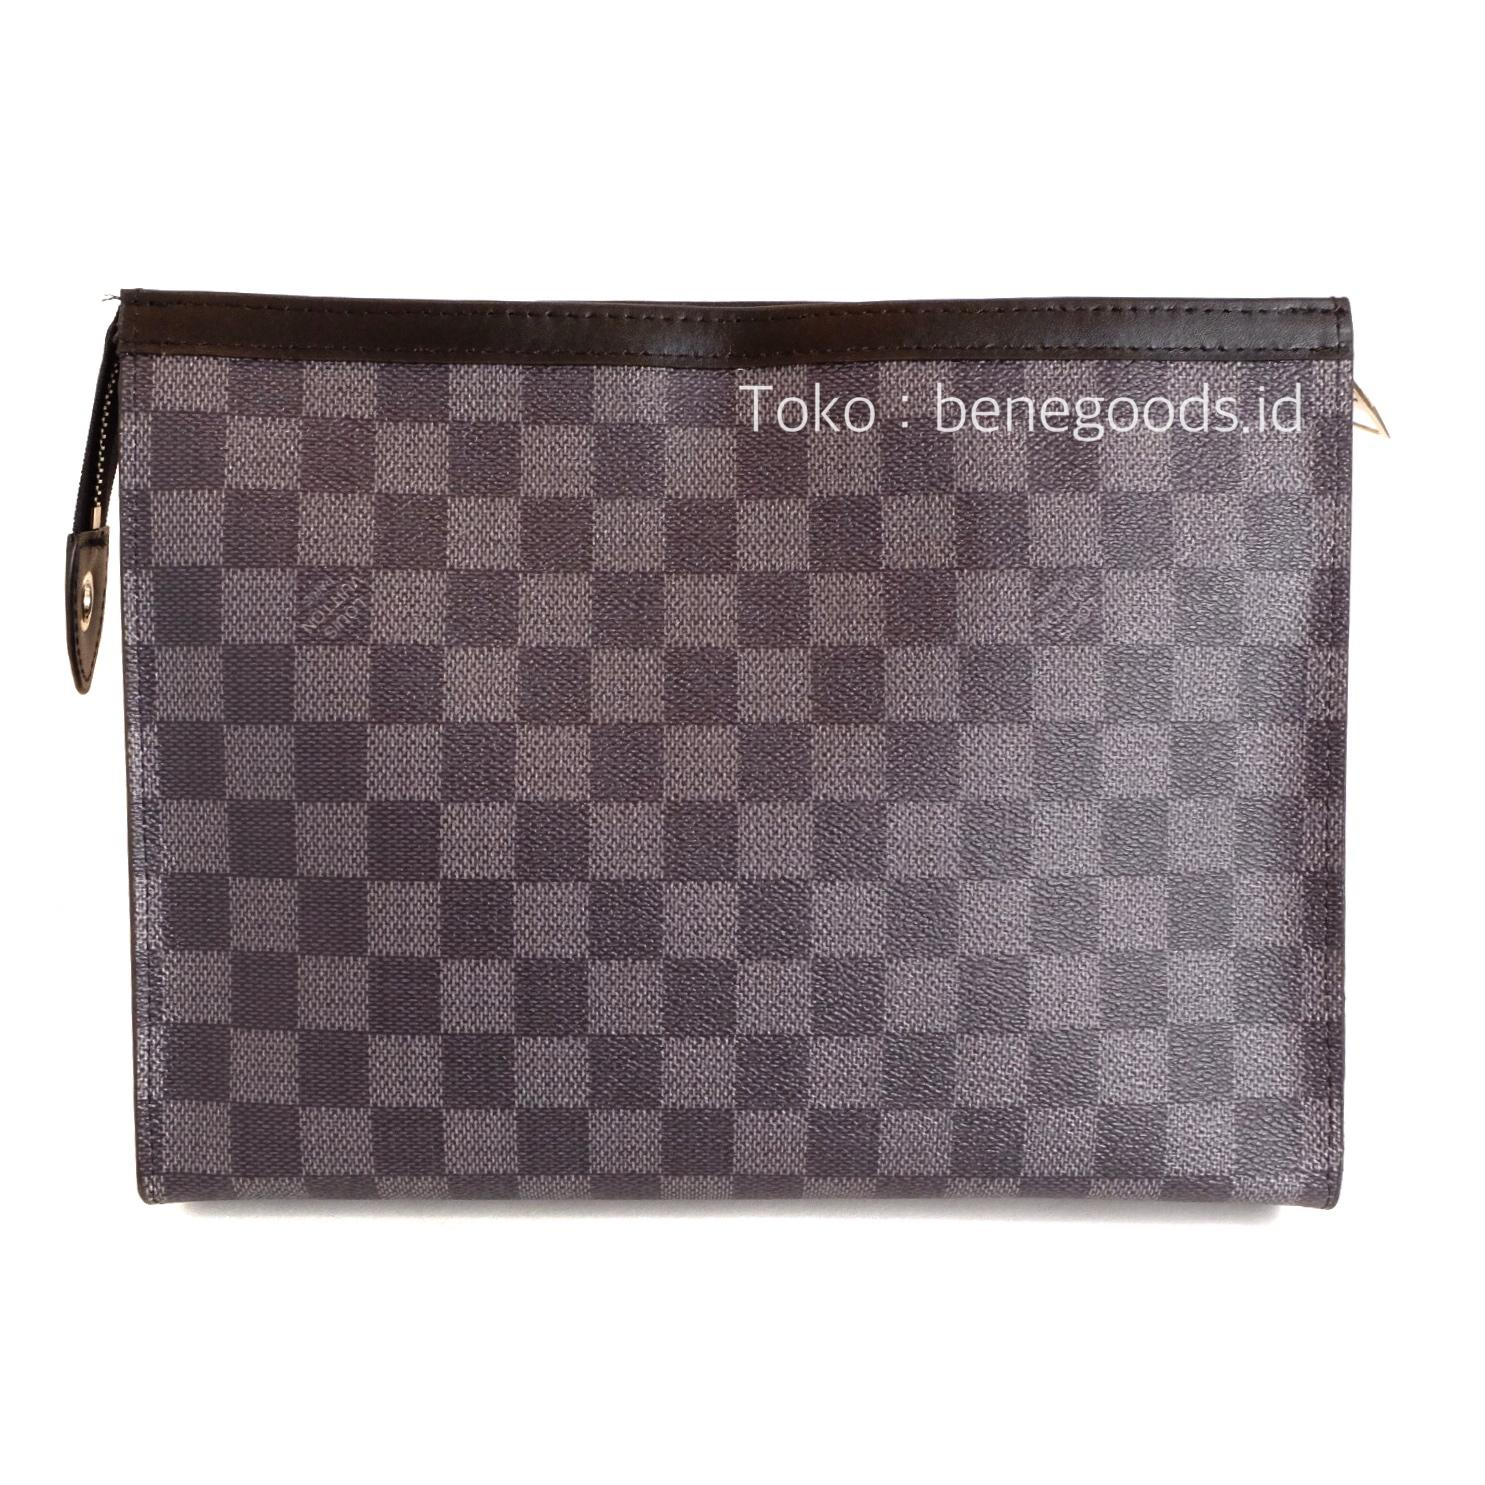 Lv Clutch 2345 Tas Clutch Wanita Hand Bag Wanita Tas Selempang ... a7ec47ea73